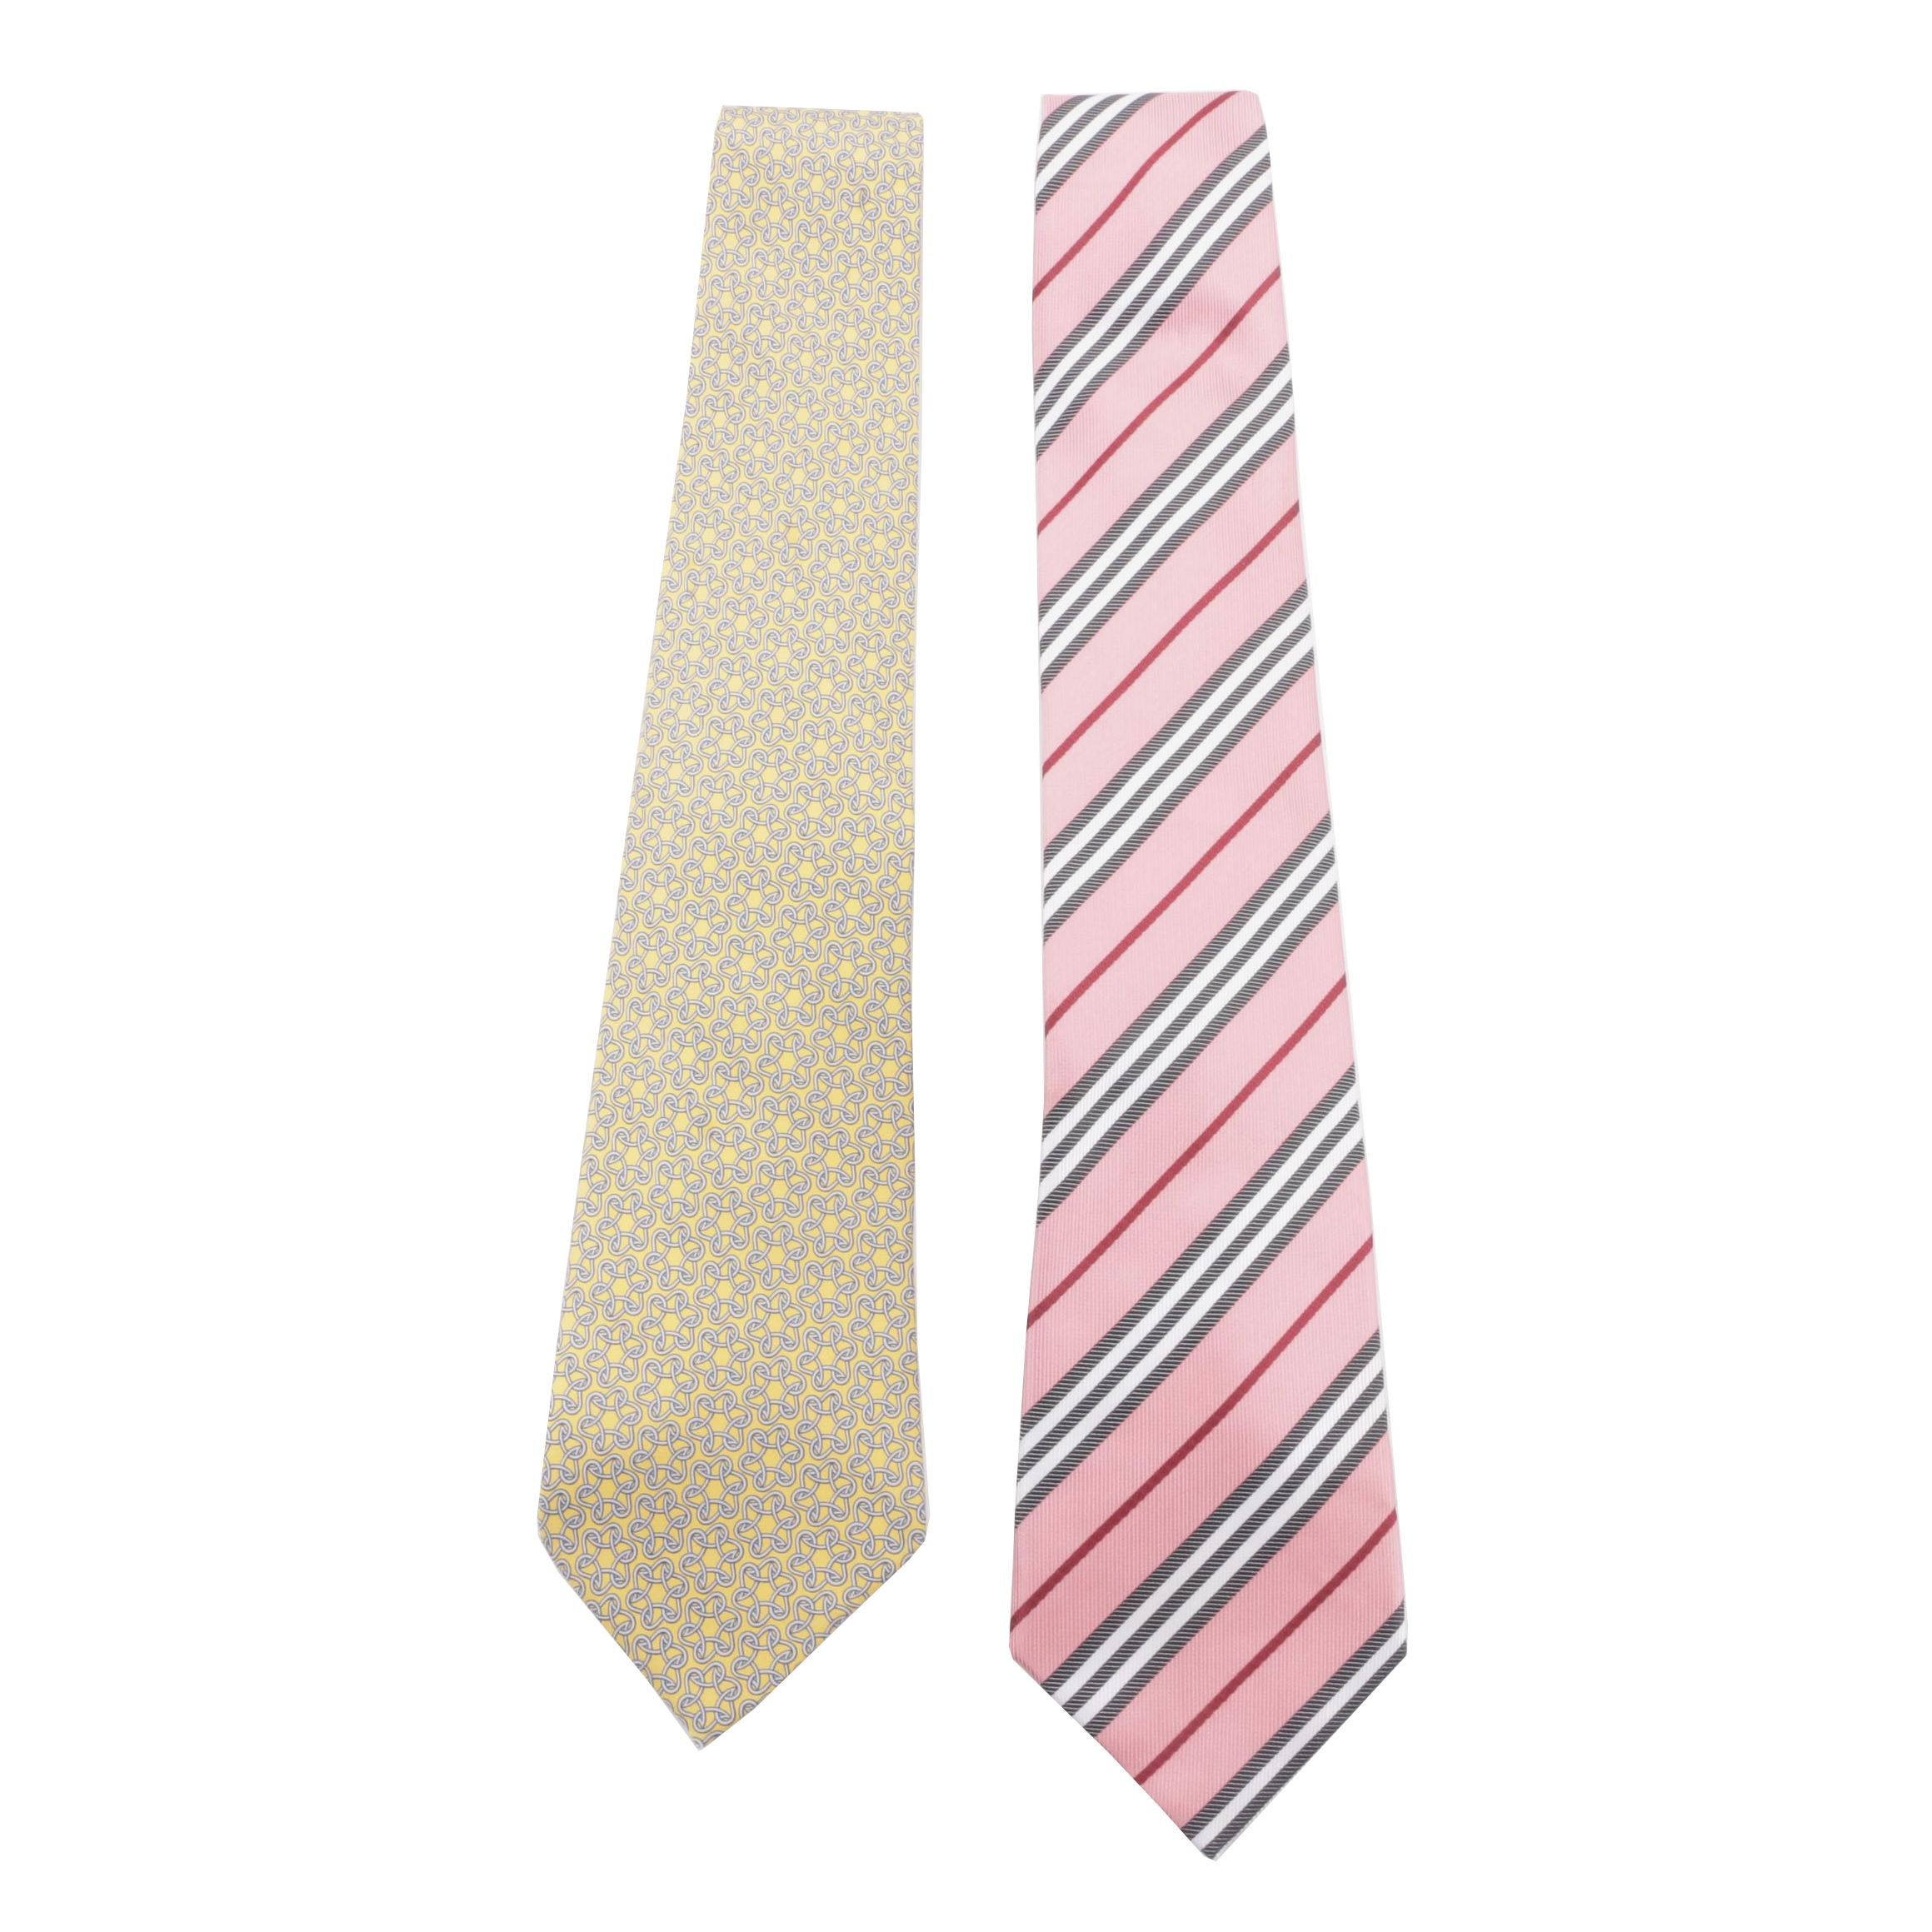 Men's Hermès of Paris and Burberry London Silk Neckties